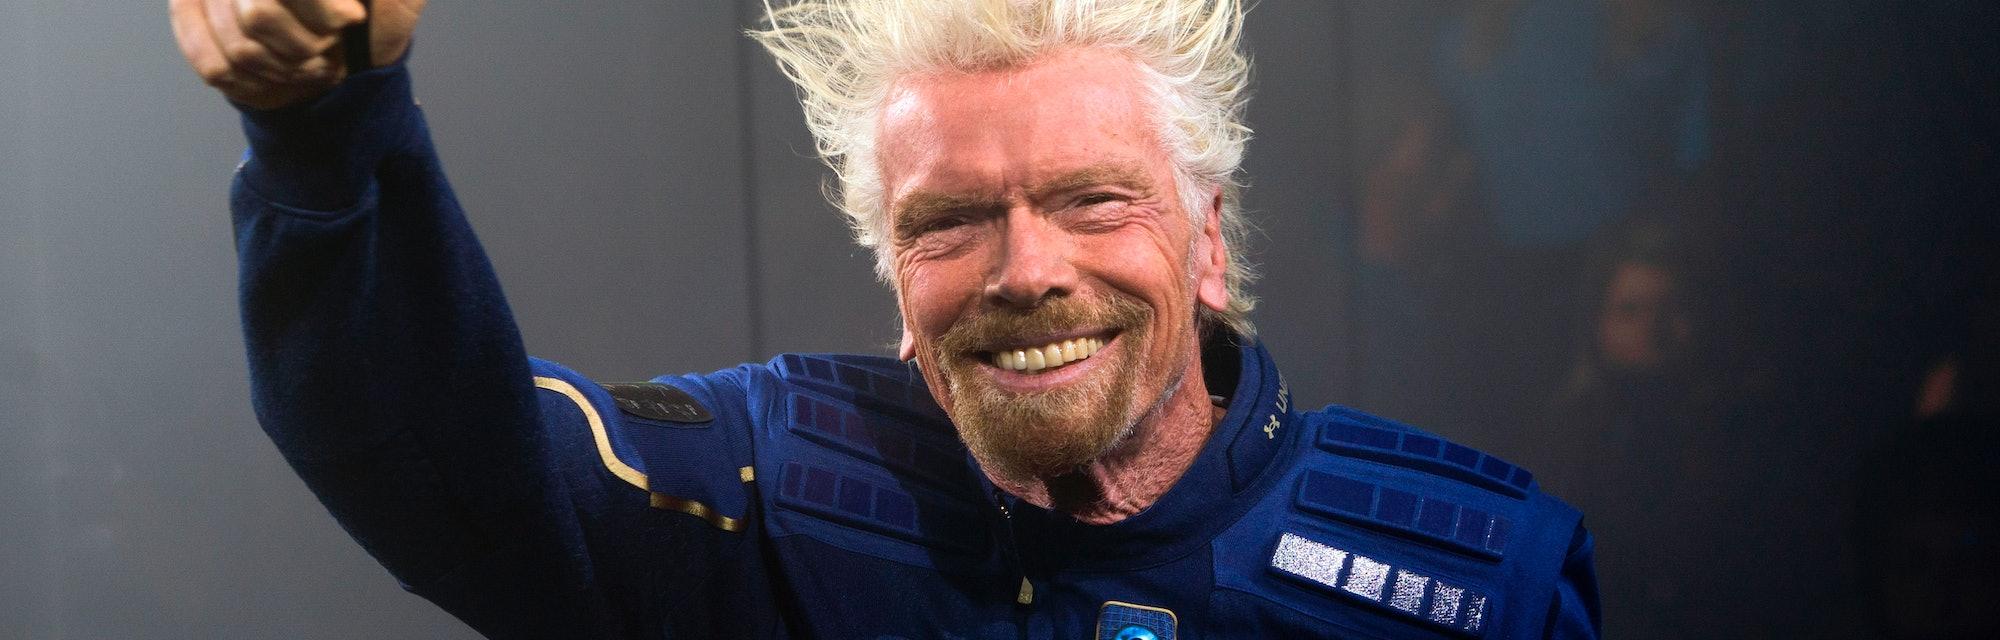 Virgin Galactic Founder Sir Richard Branson demonstrates a spacewear system, designed for Virgin Gal...